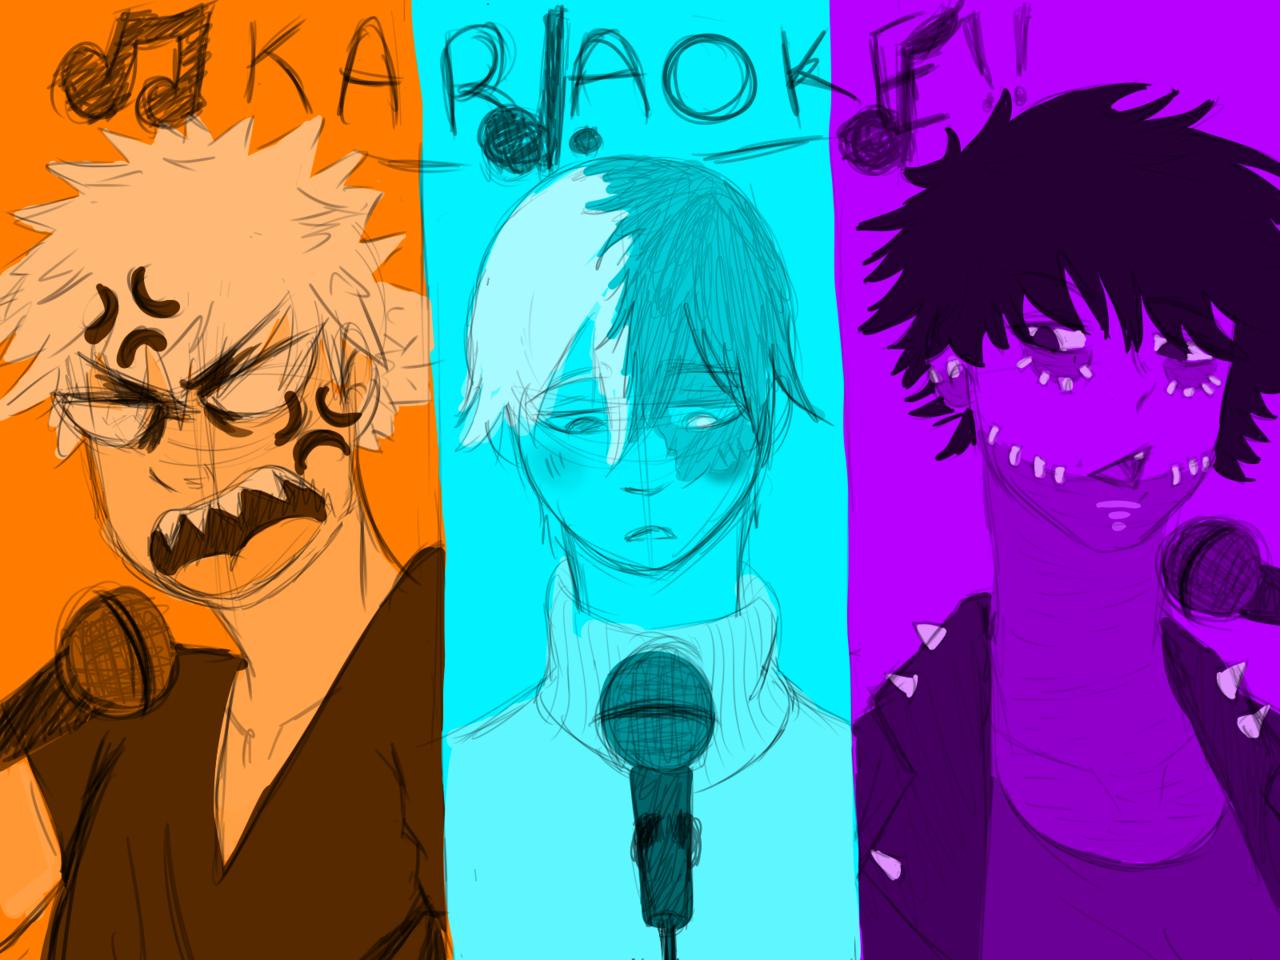 BNHA Karaoke!!